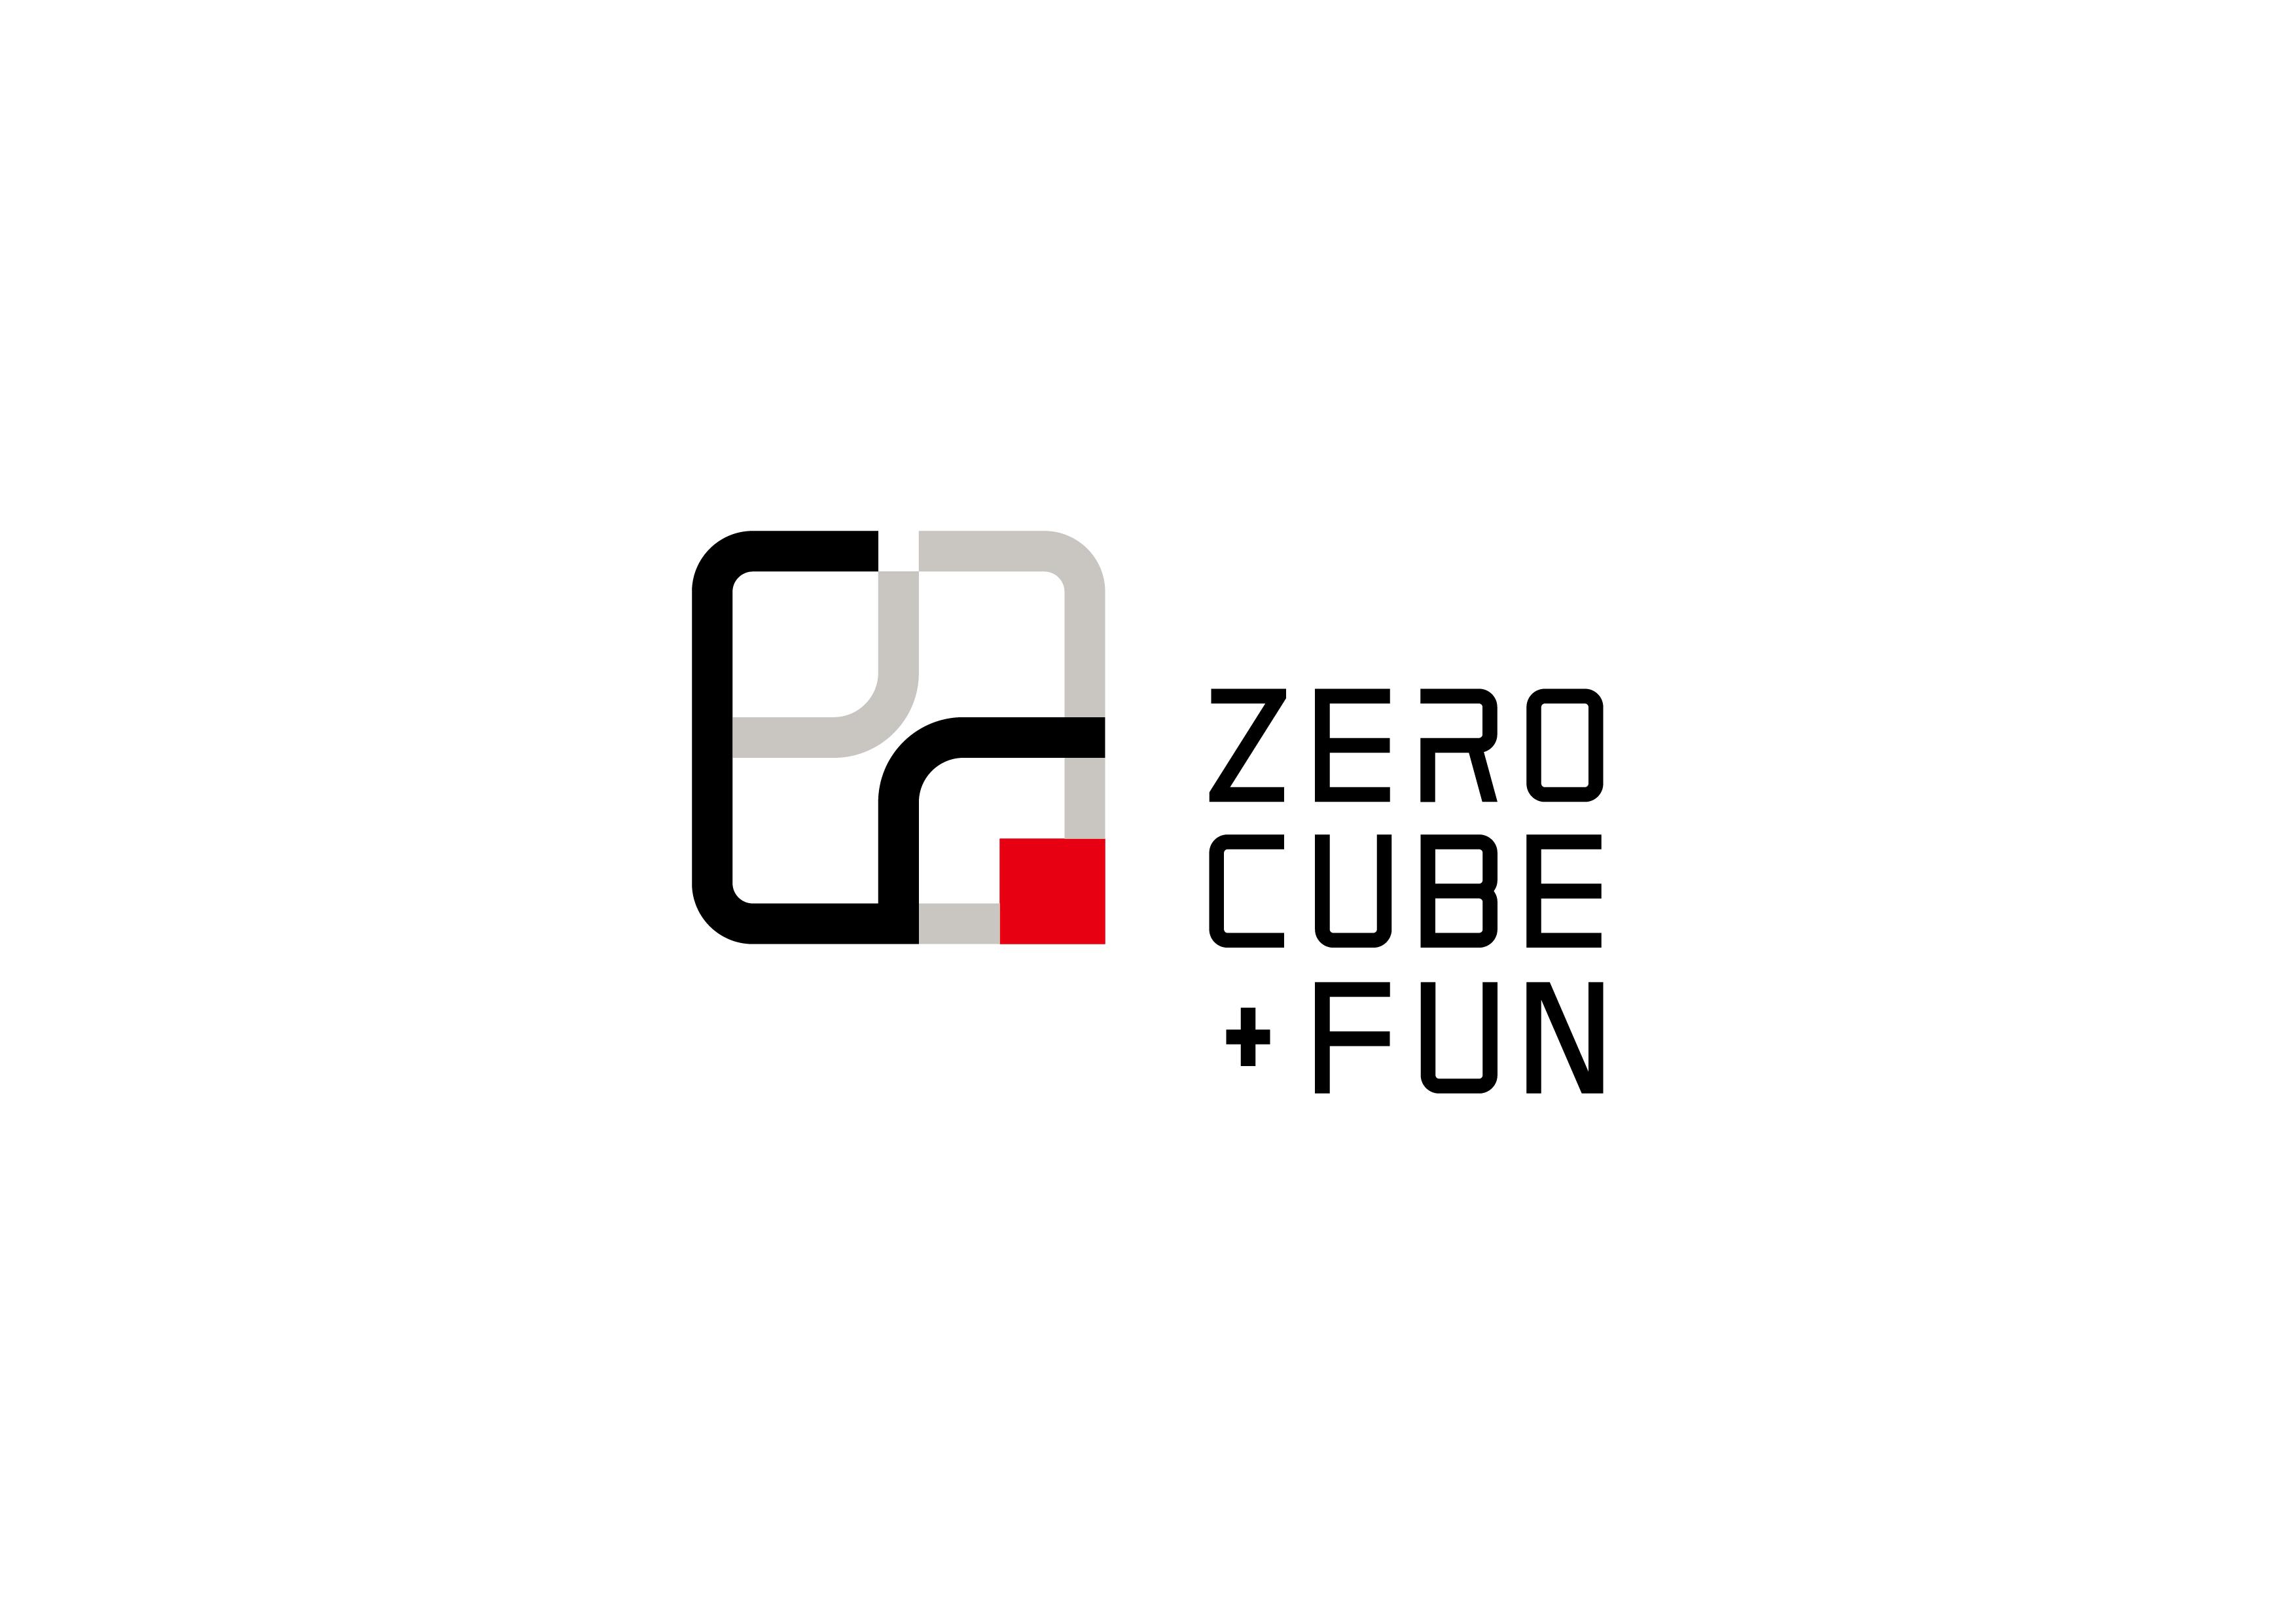 BETSUDAI ZERO CUBE + FUN ロゴ